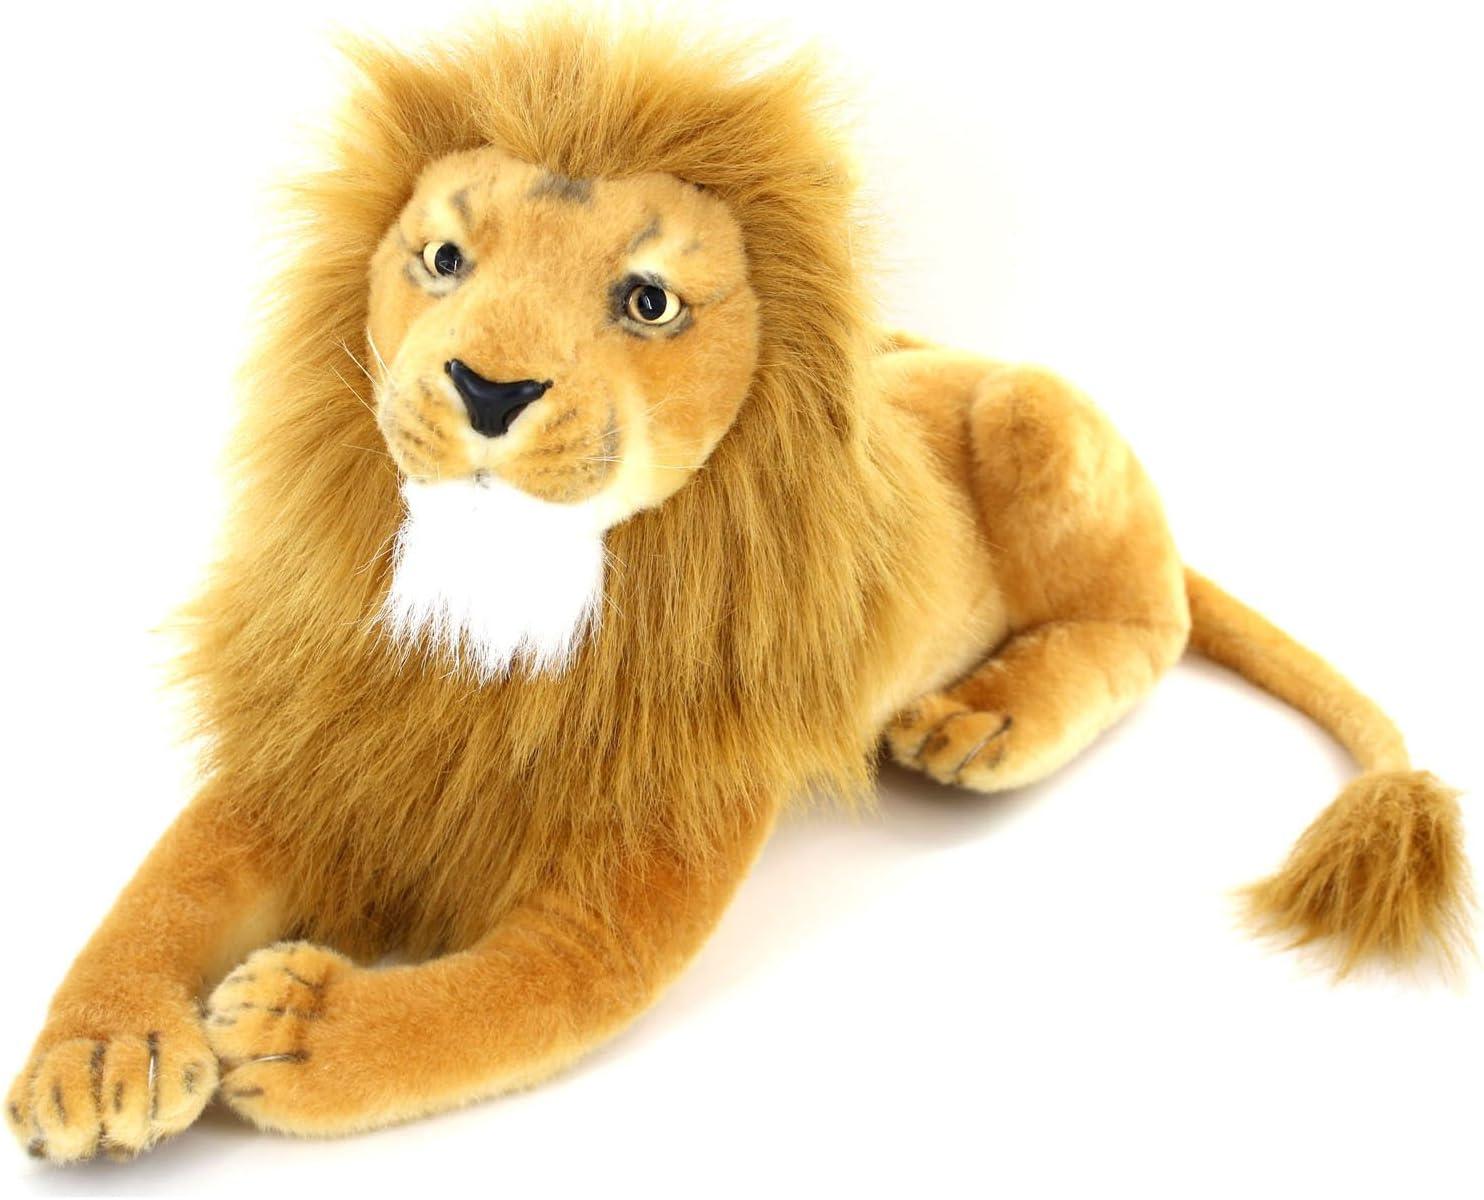 JESONN Stuffed Animals Toys Lion Plush (27.5 Inches)